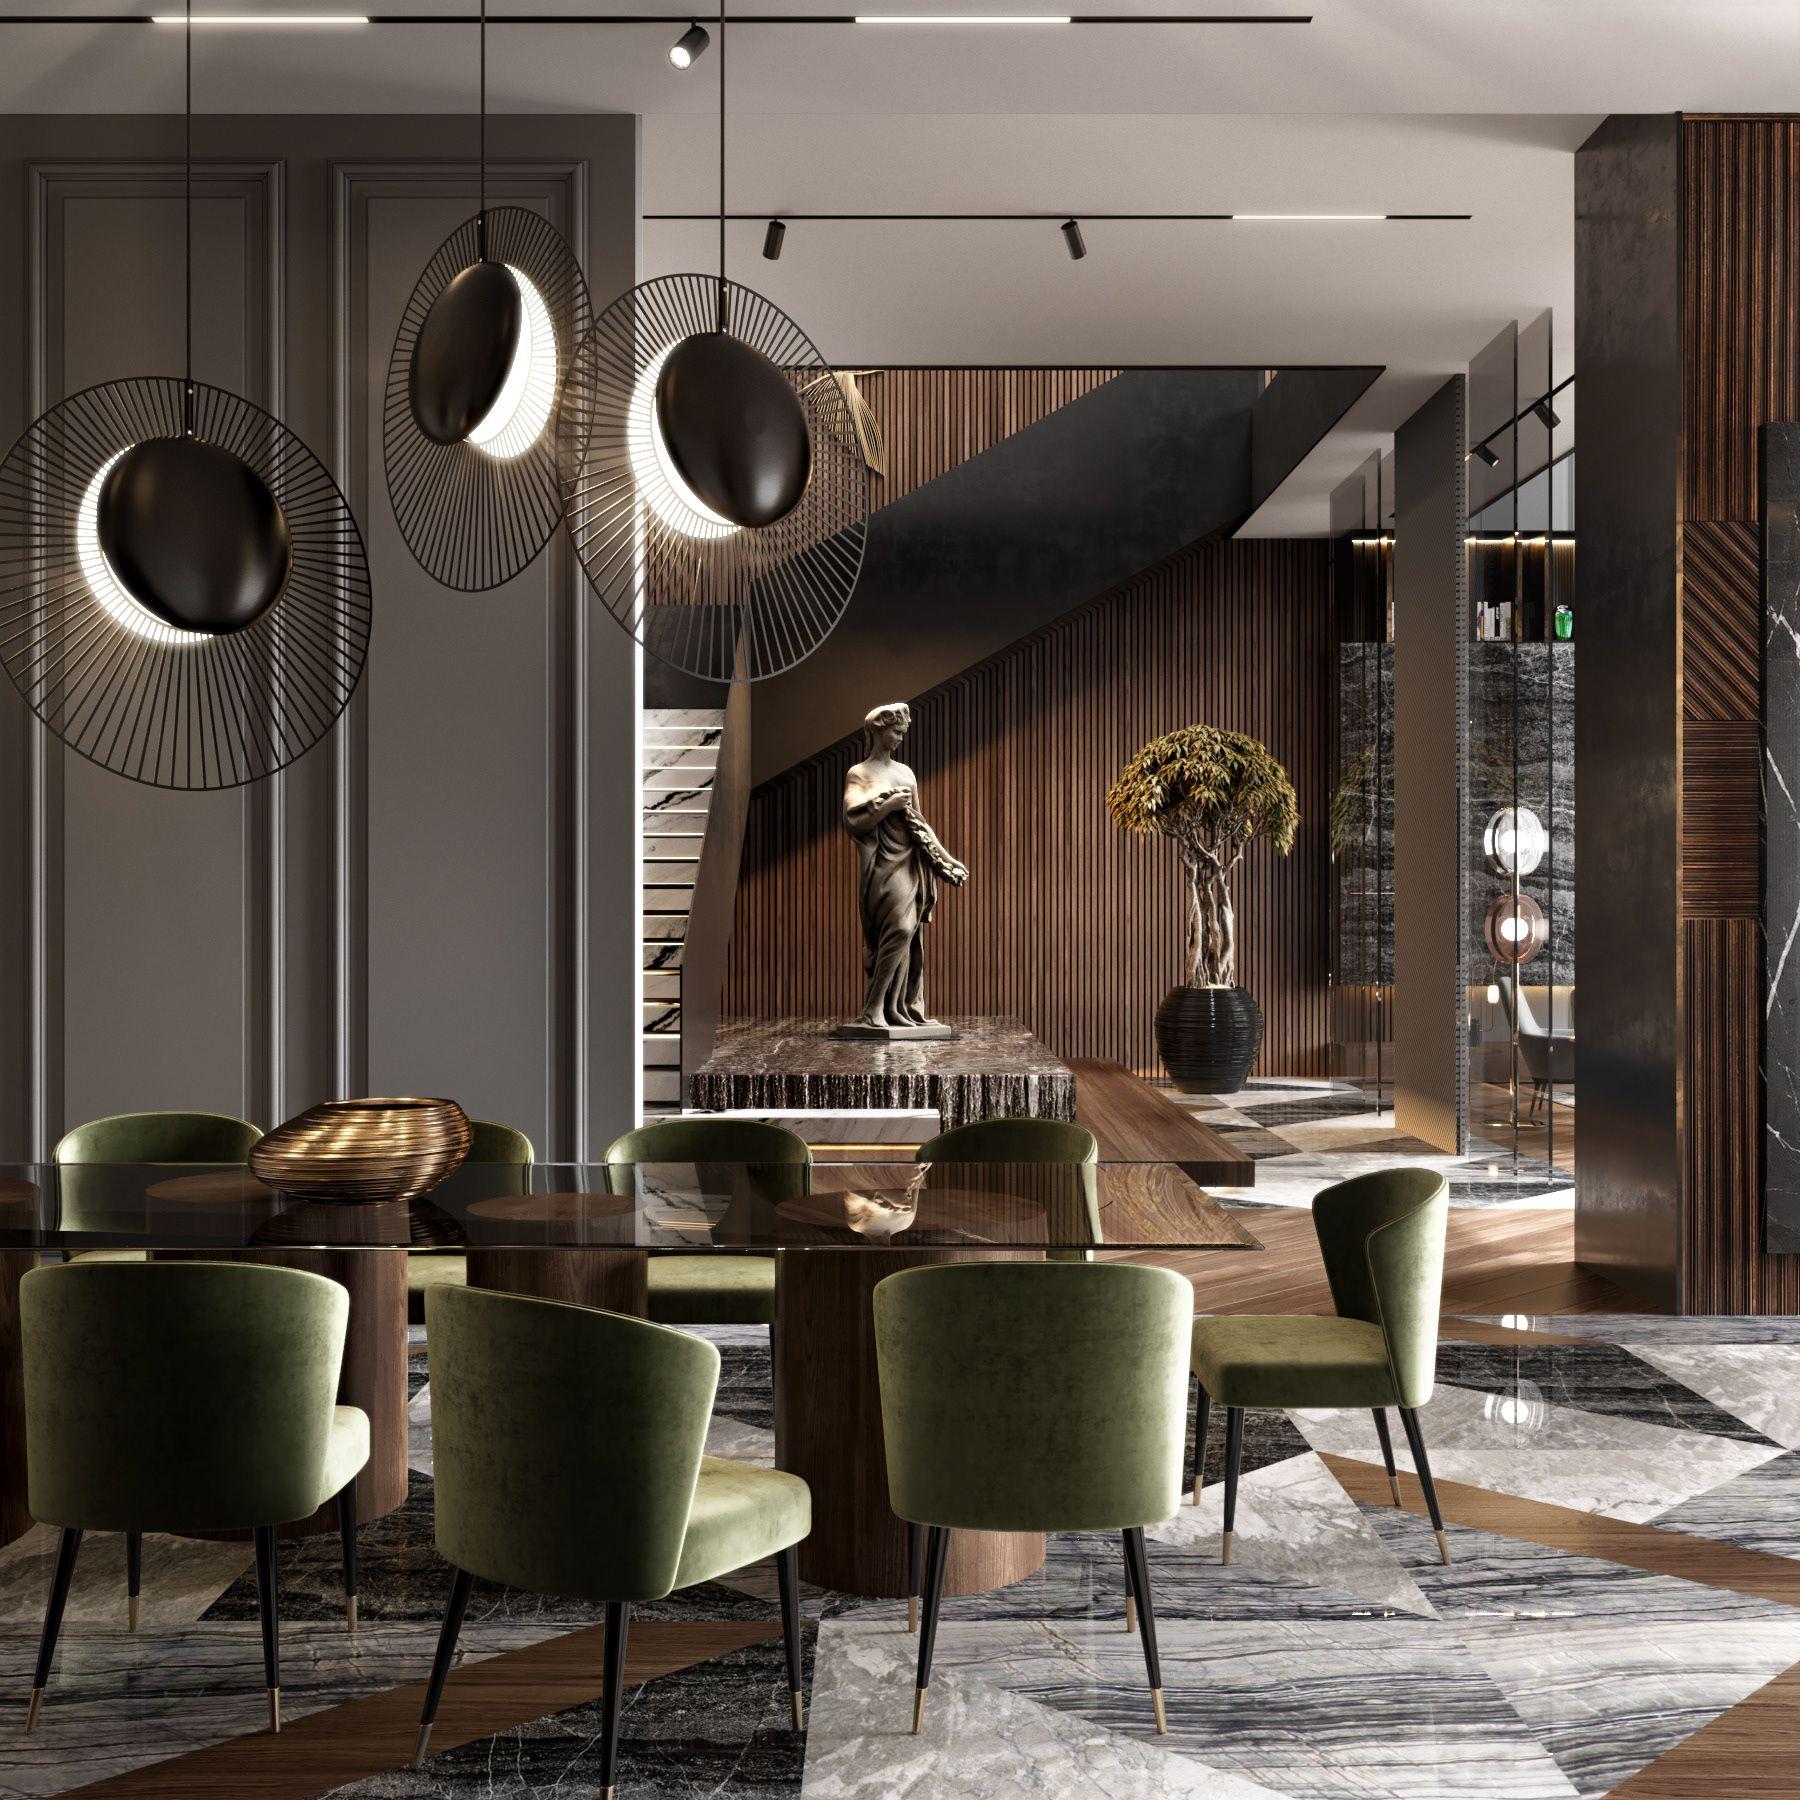 Luxury Master Bedroom Dubai On Behance: RESIDENTIAL HOUSE IN DUBAI. SPACES/ARCHITECTS On Behance